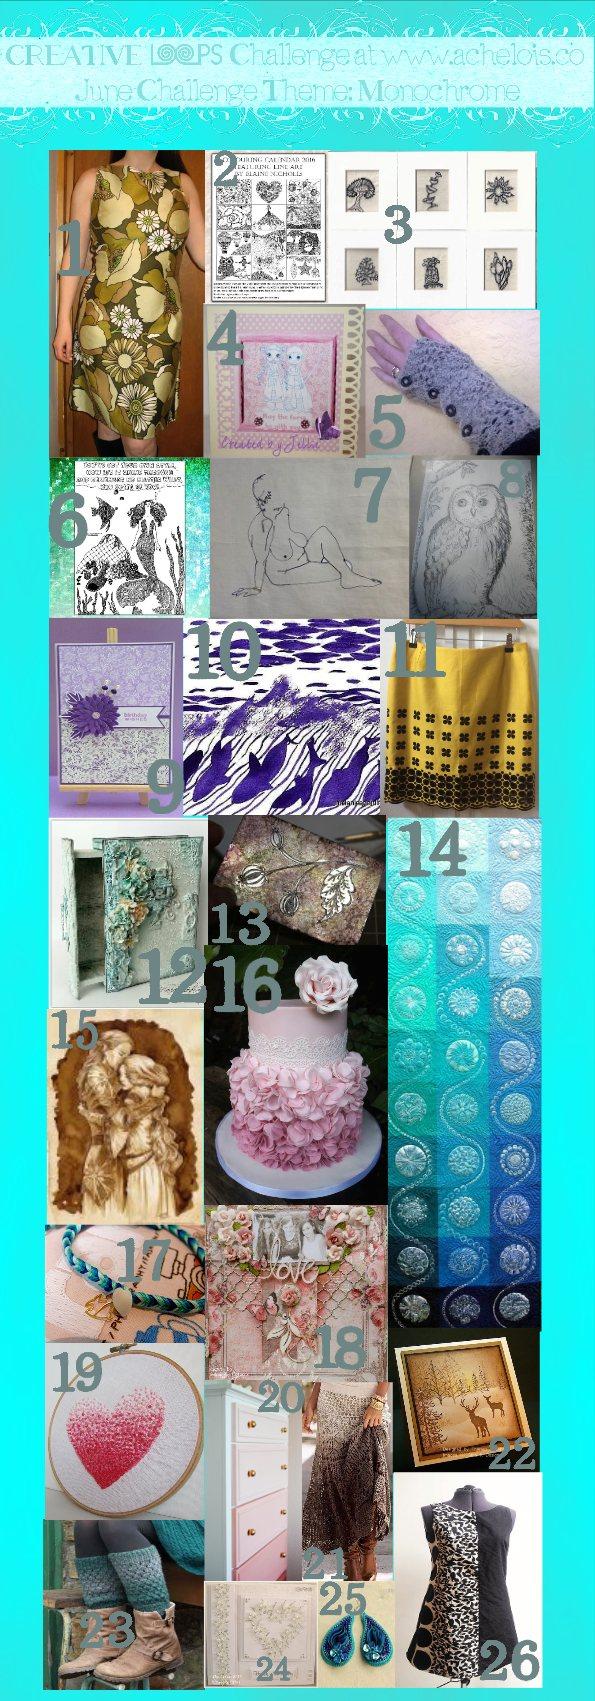 Inspiration creative loops challenge monochrome